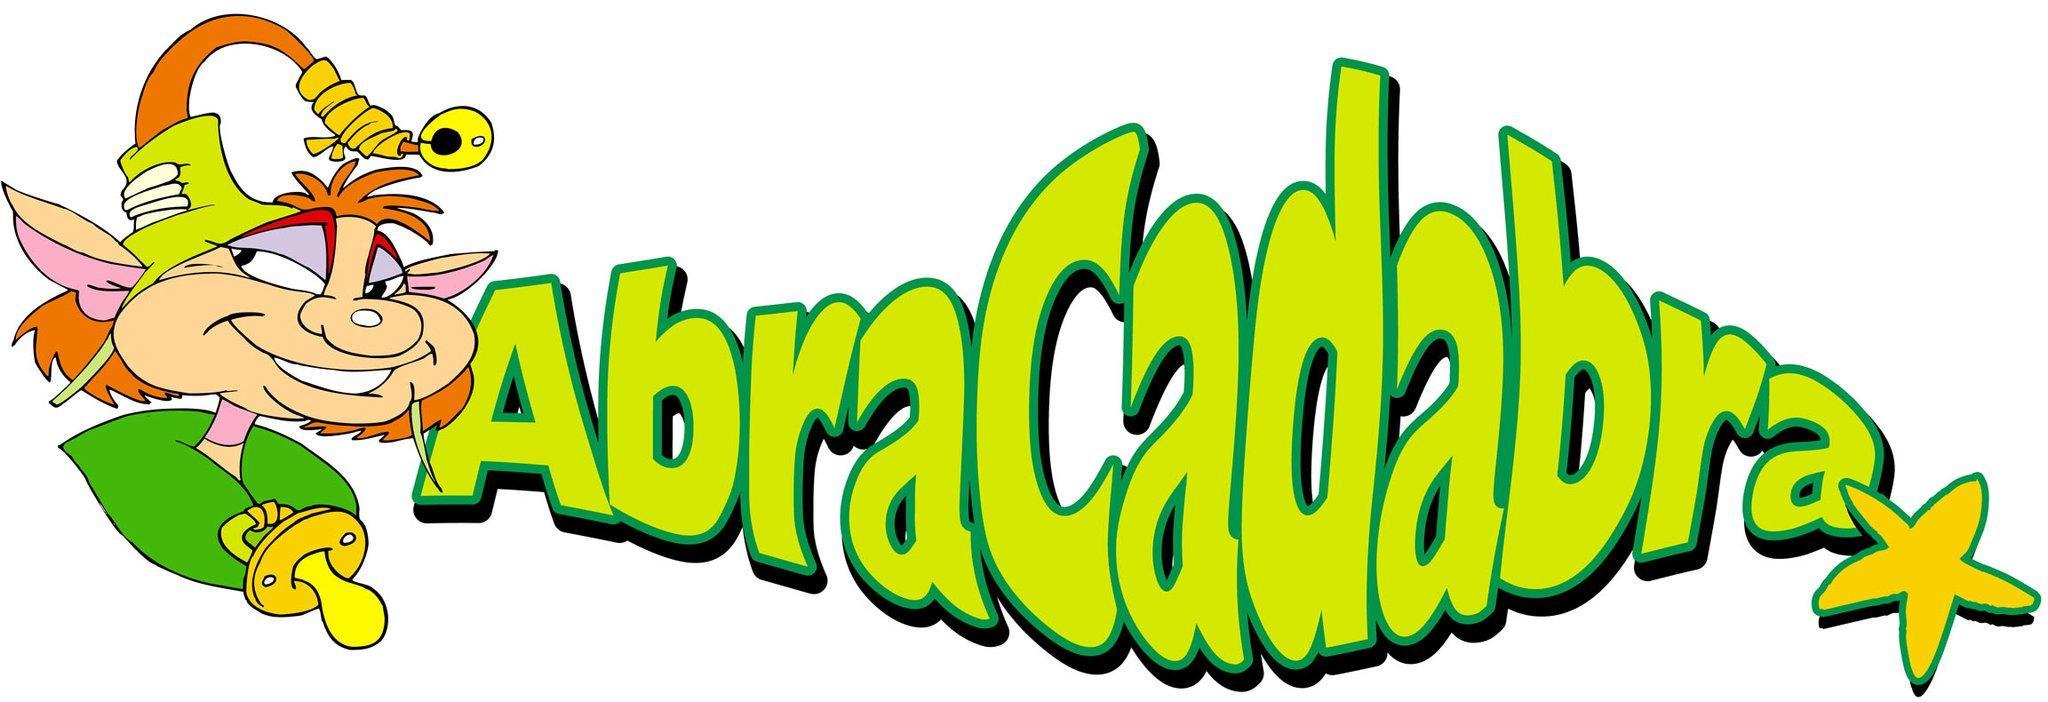 Abracadabra Ocio